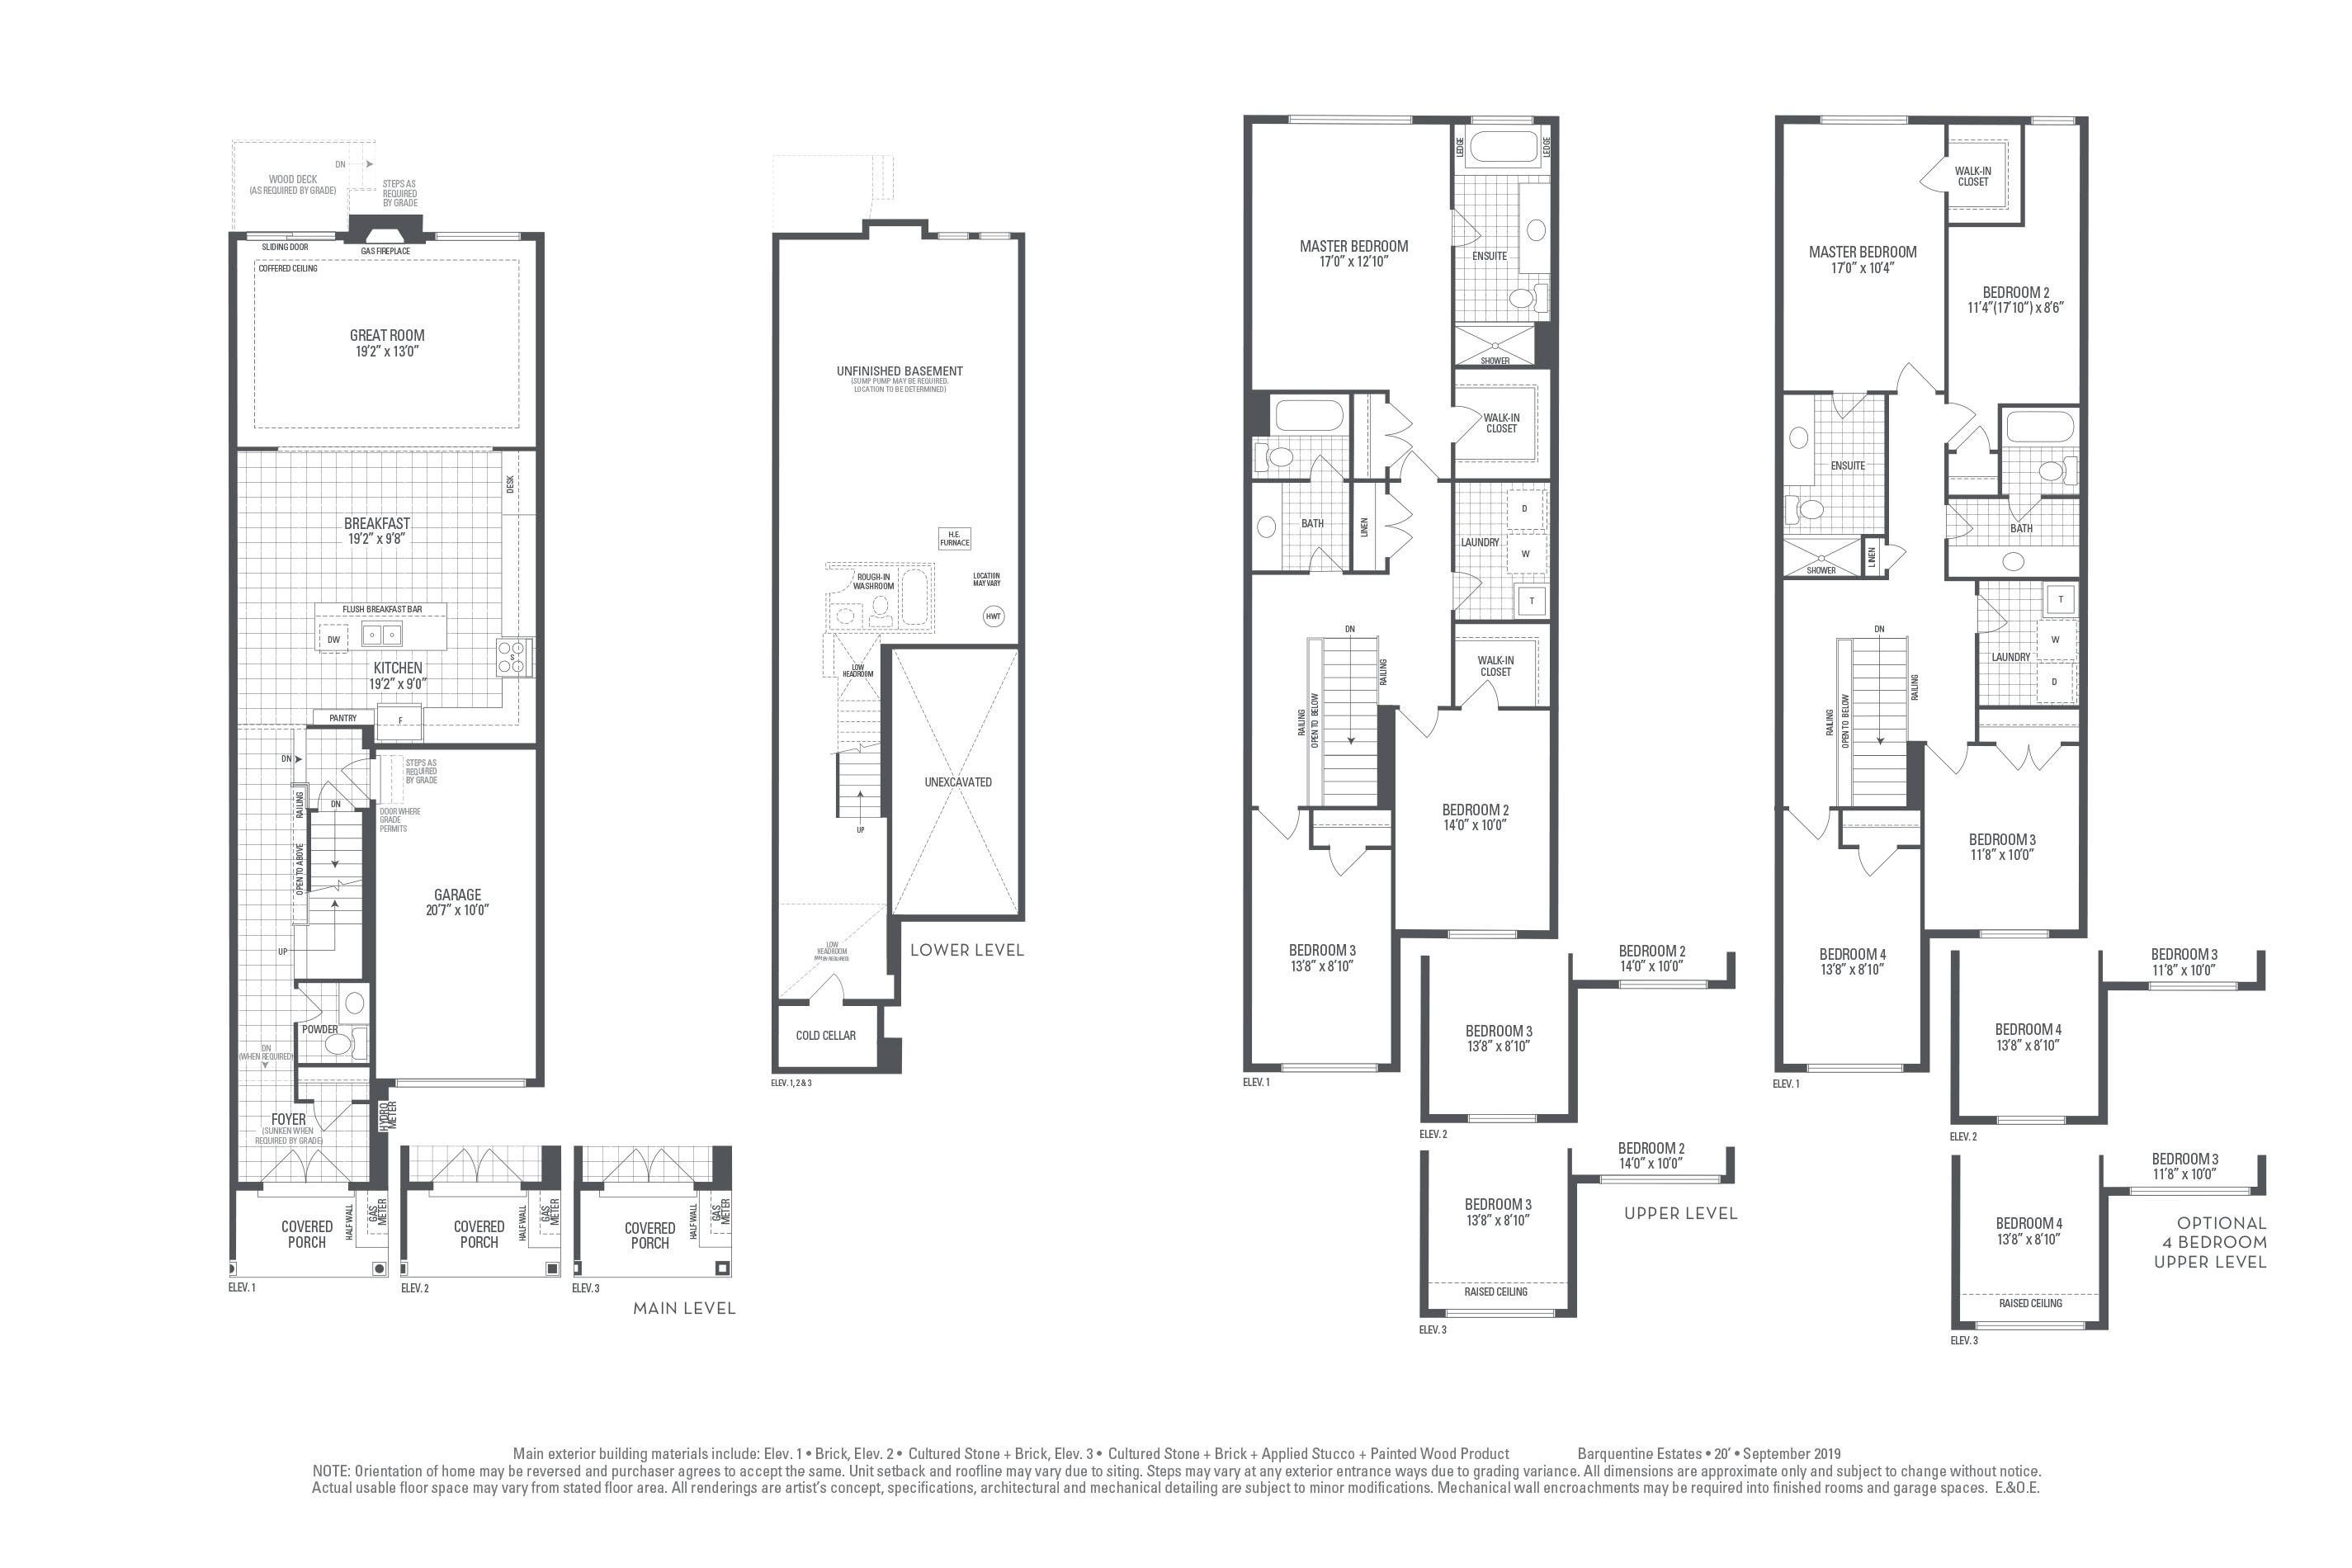 Hudson 03 Elev. 1 Floorplan